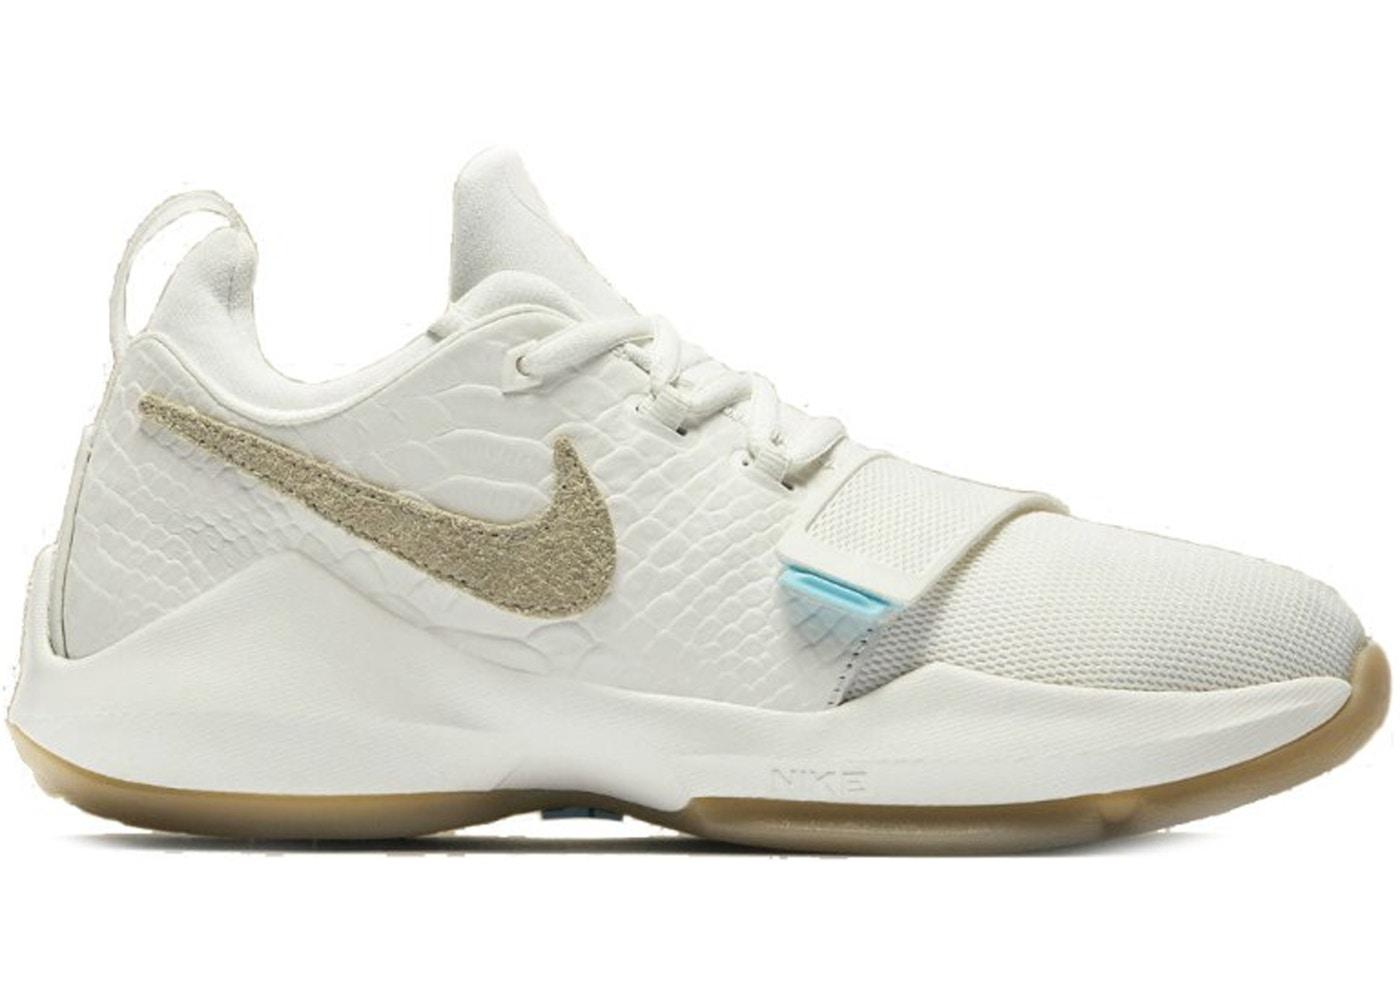 sale retailer 99ef6 034c5 Nike PG 1 Ivory